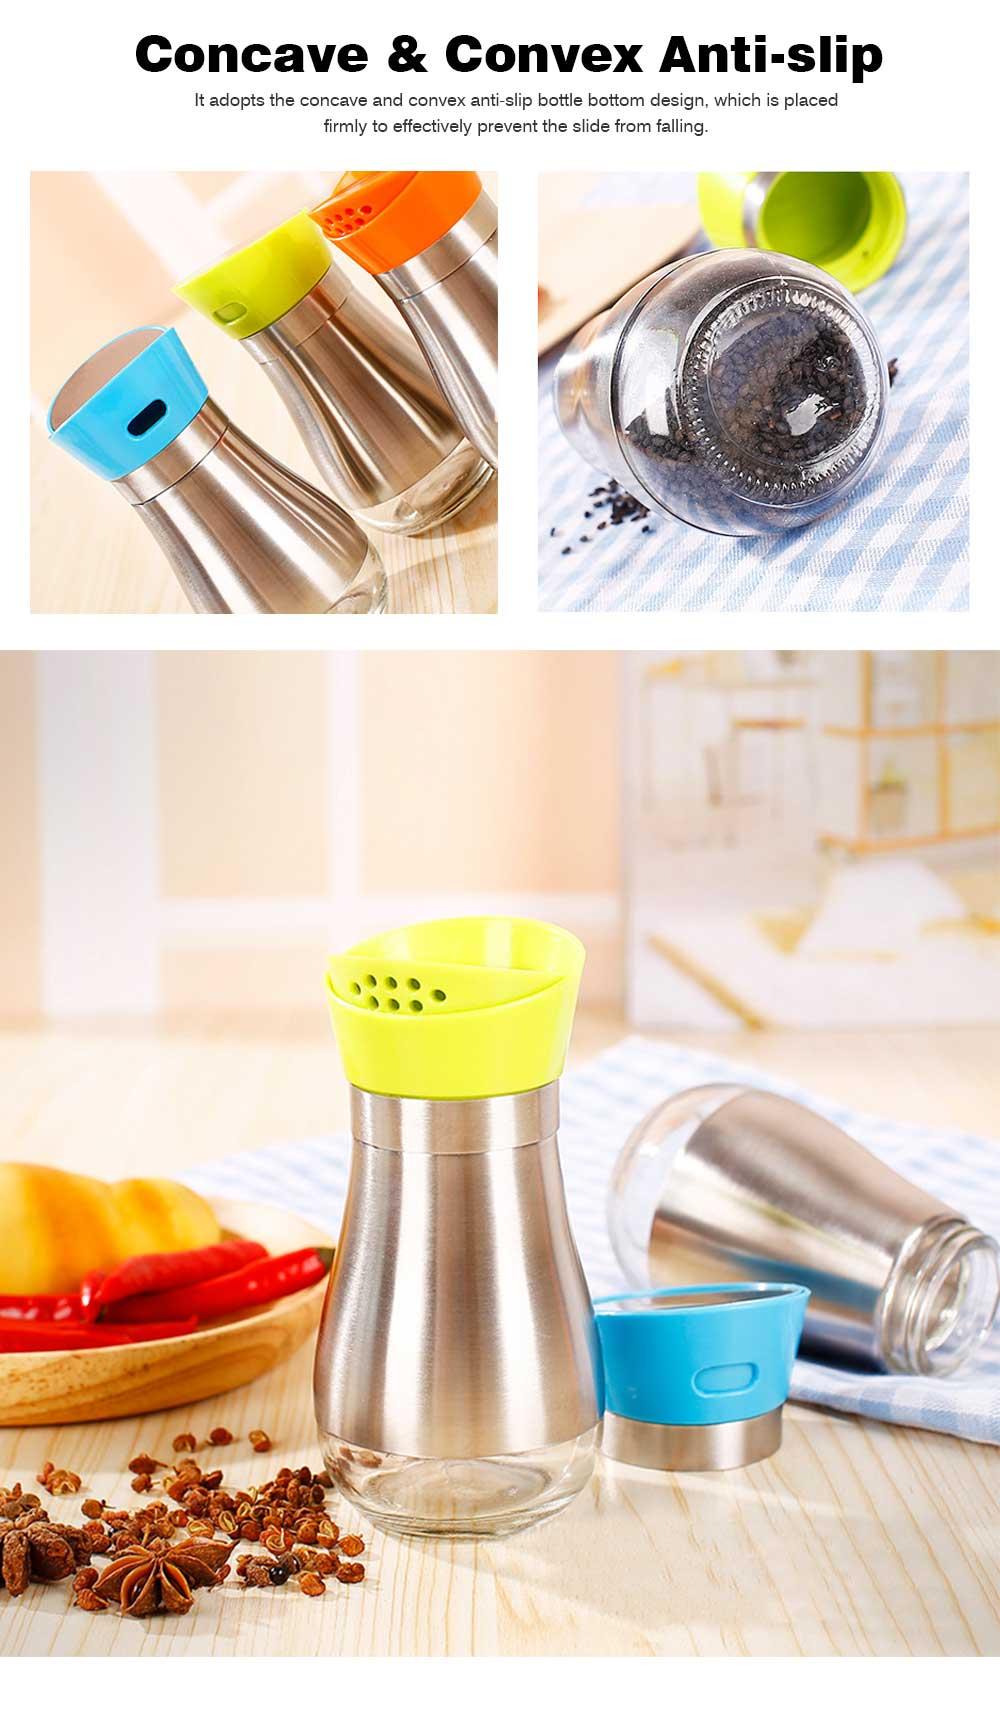 Stainless-steel Sauce Bottle for Putting Pepper, Salt, Chicken Essence, Double-Opening Seasoning Glass Bottle 4